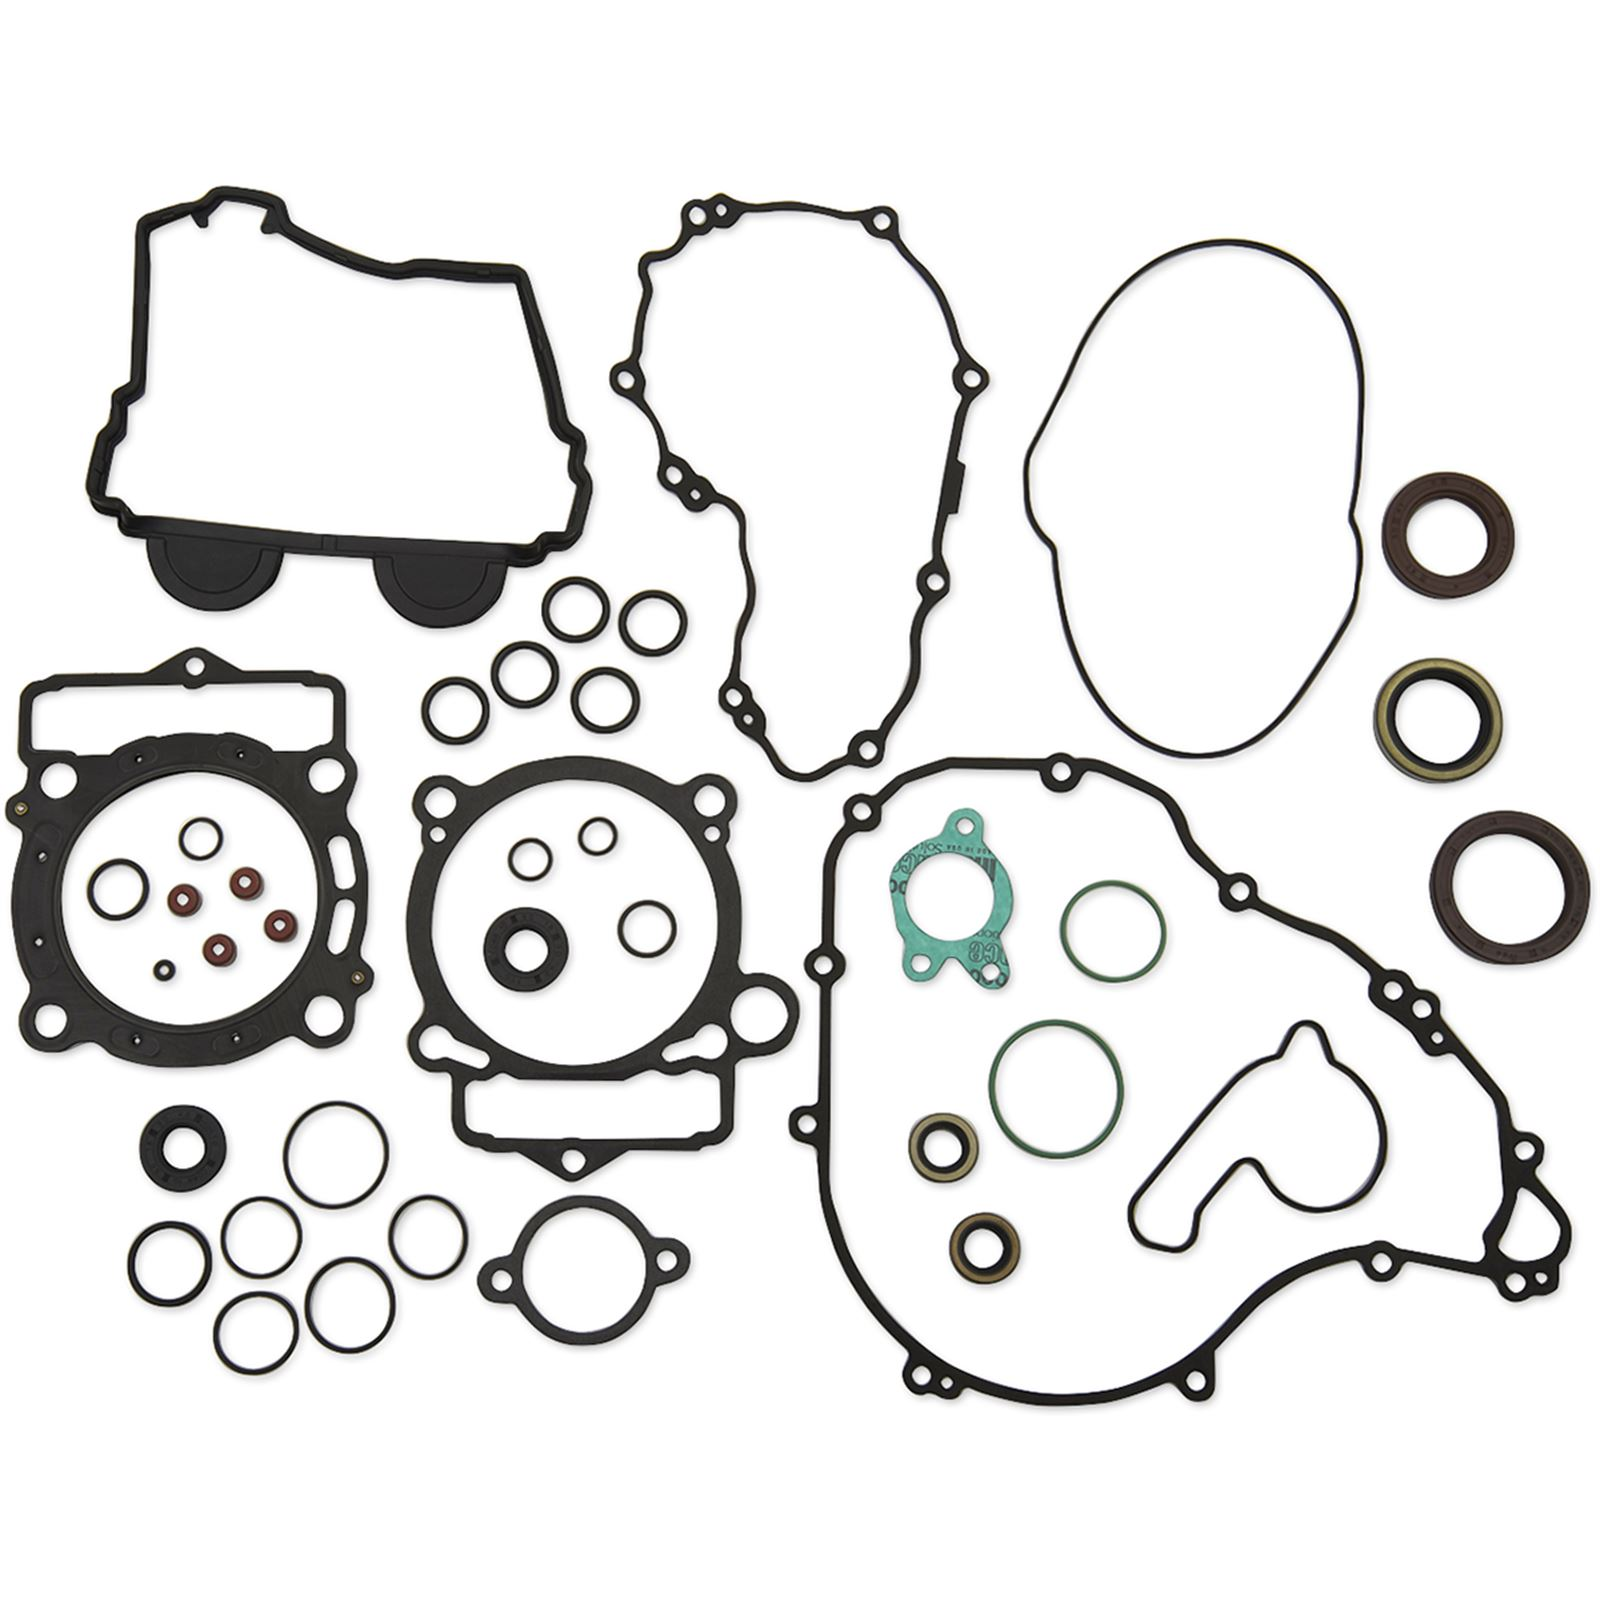 Moose Racing Motor Gasket Kit with Seal Husqvarna/KTM